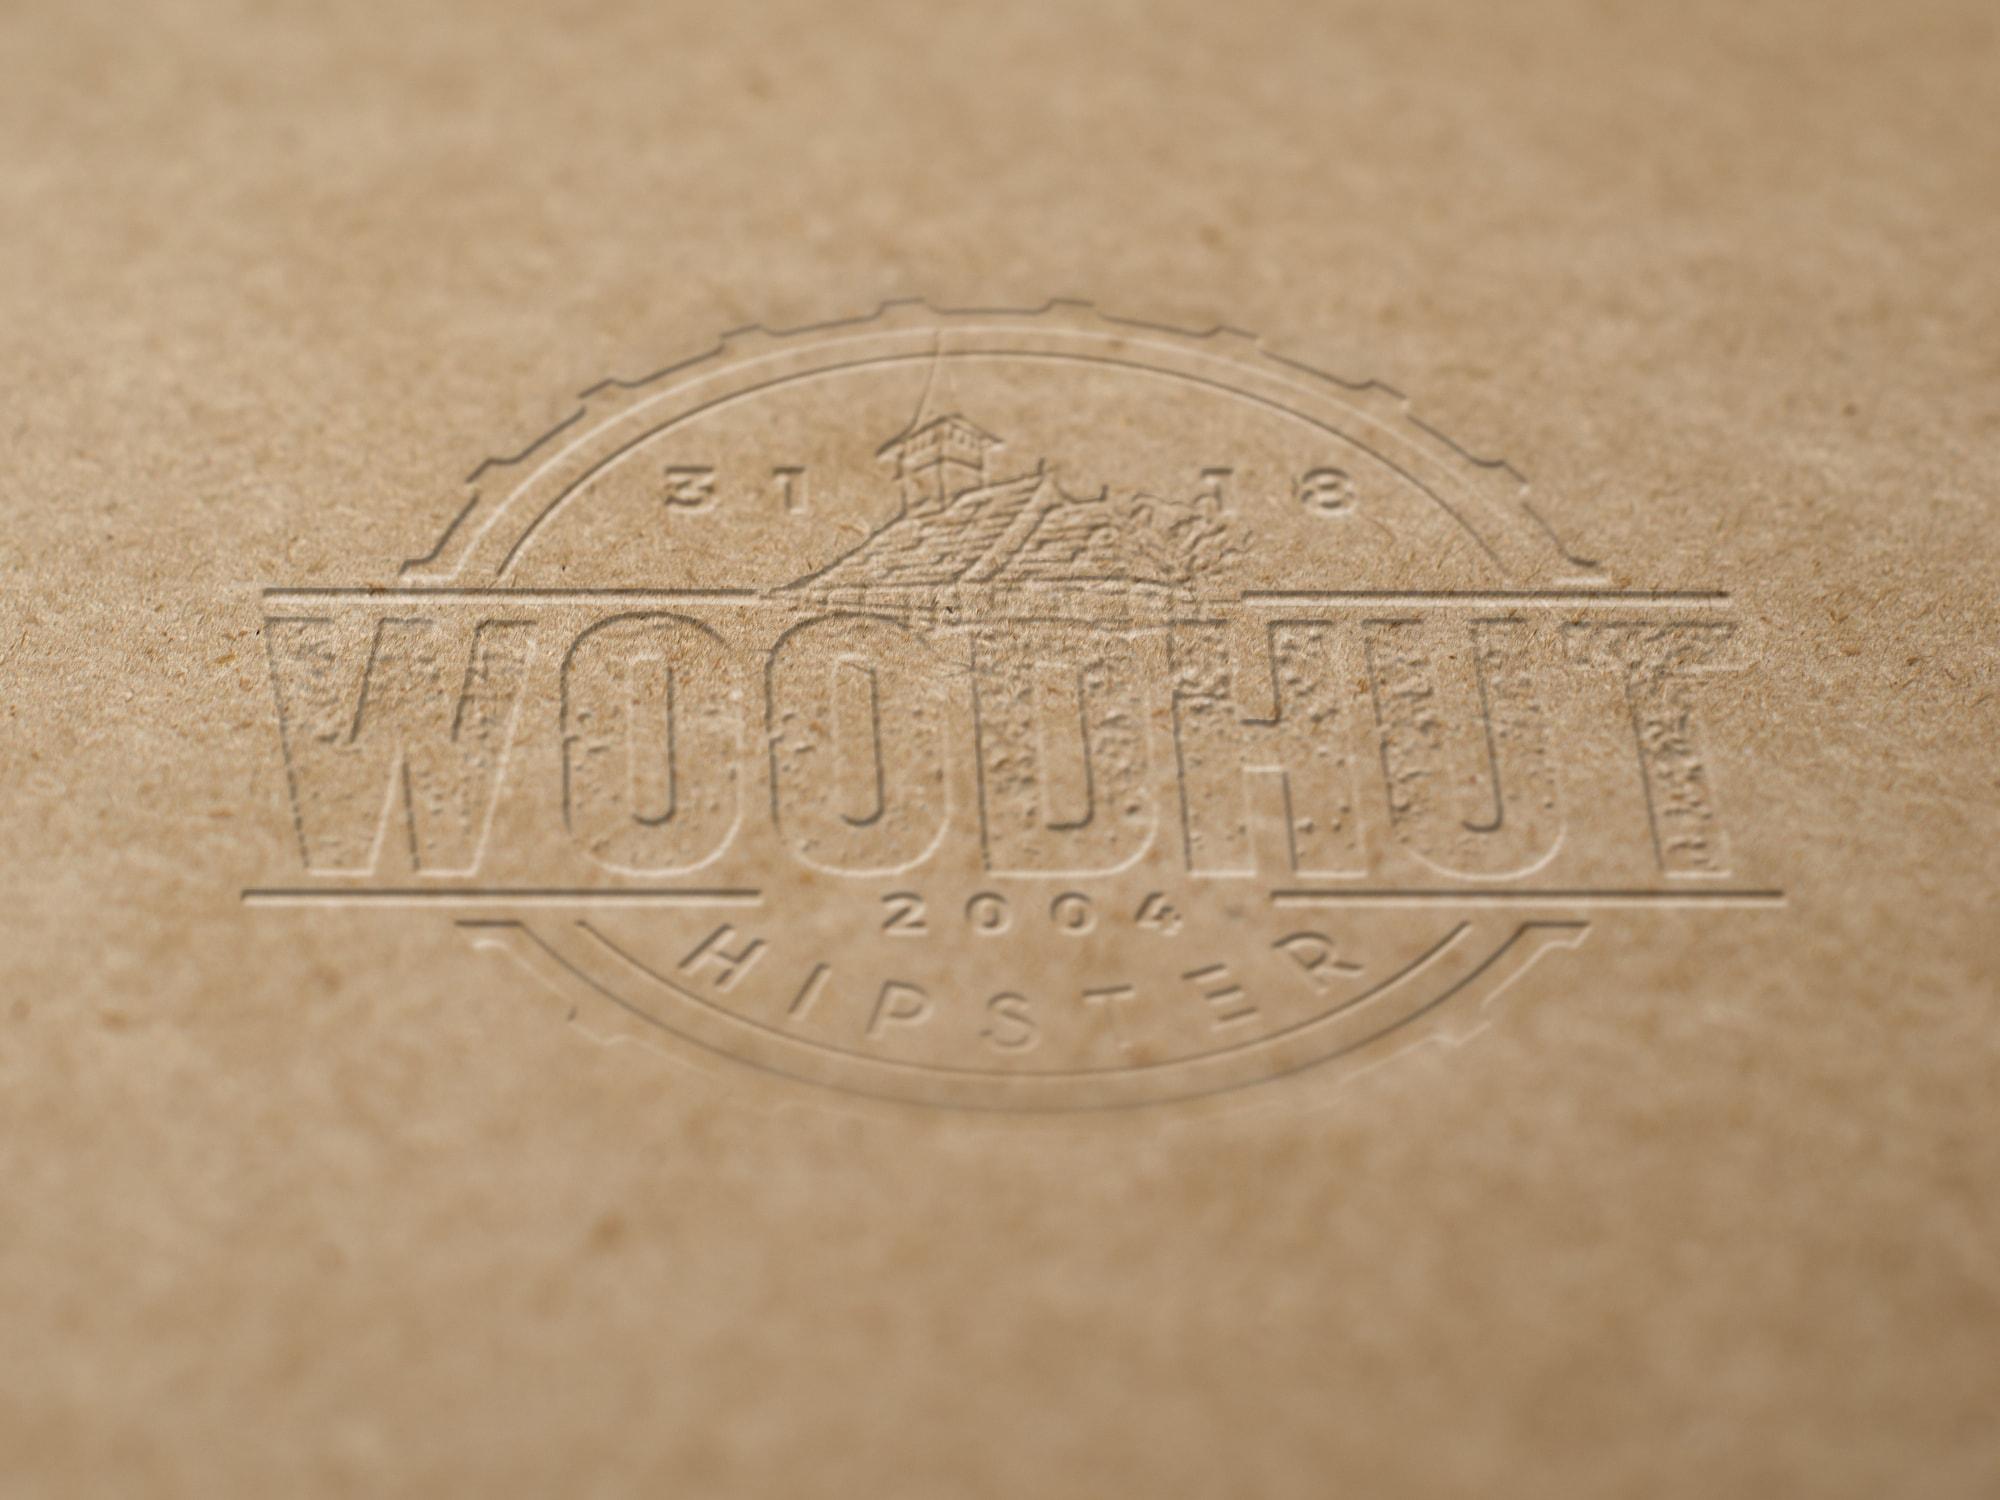 wood-logo-mockup-230514188-min